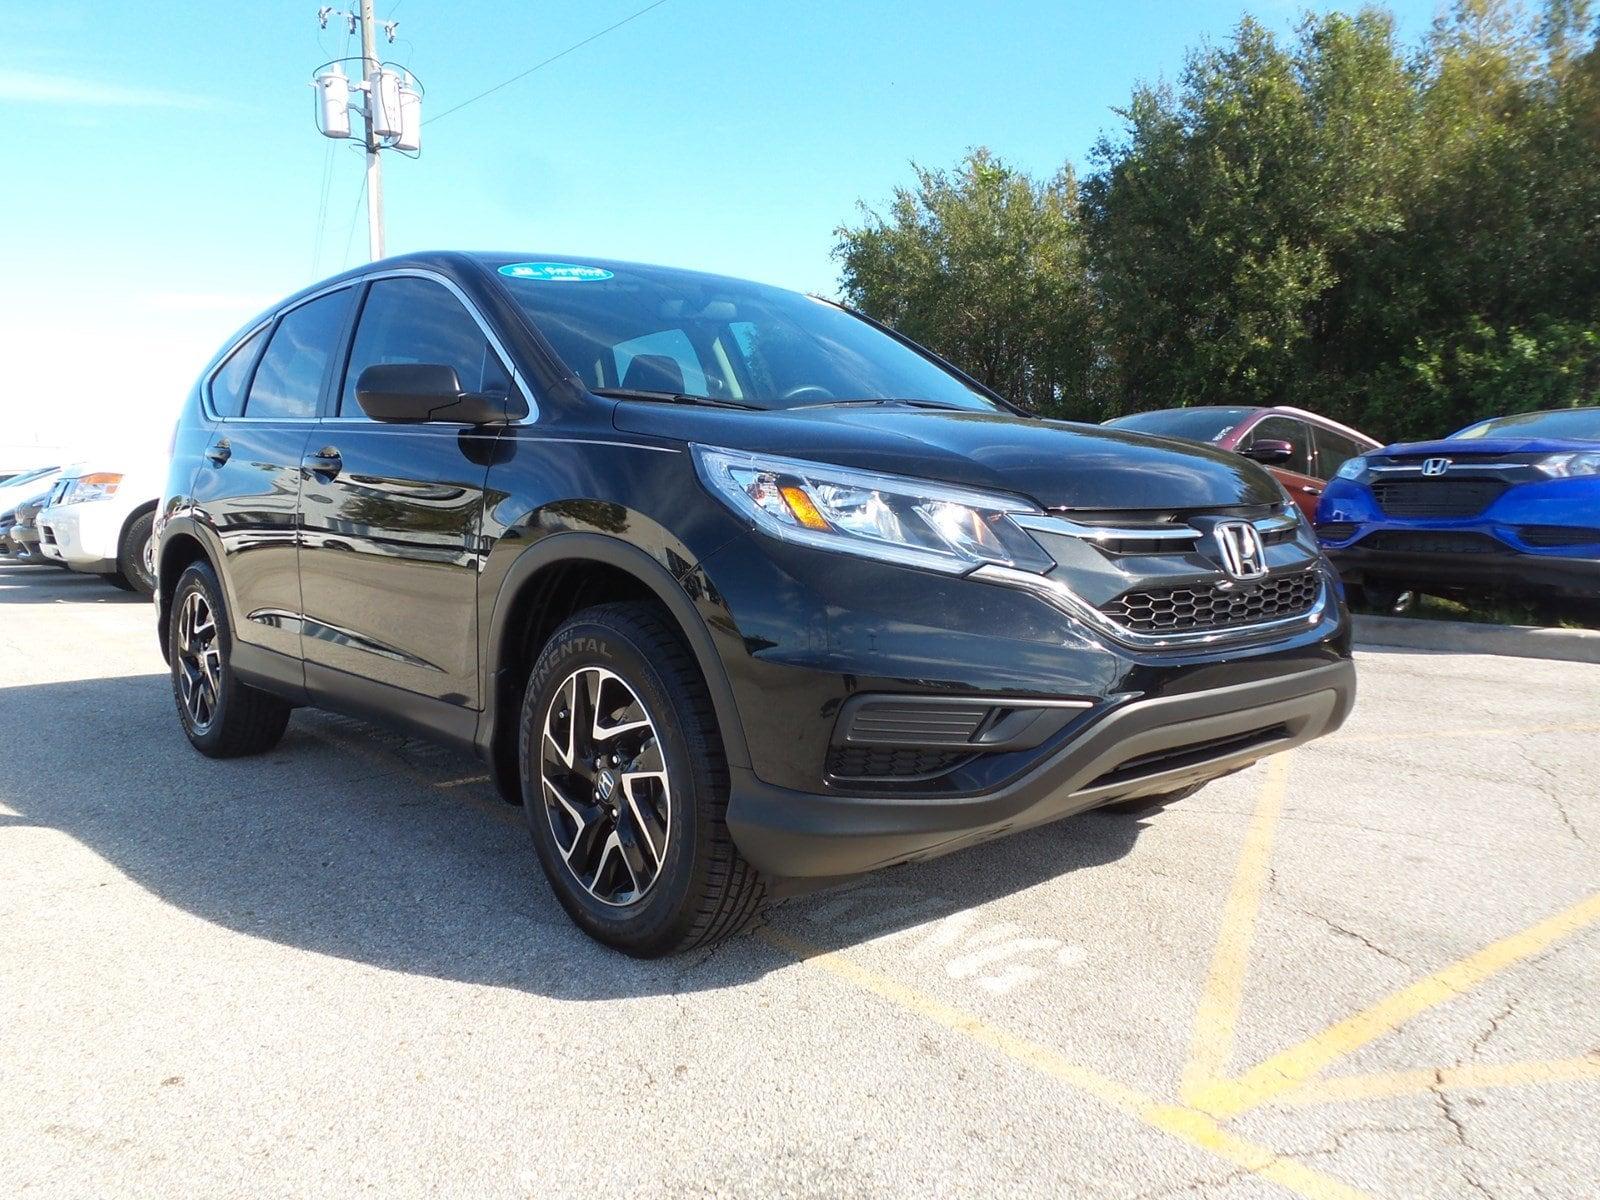 Pre-Owned 2016 Honda CR-V SE FWD SUV in Jacksonville FL